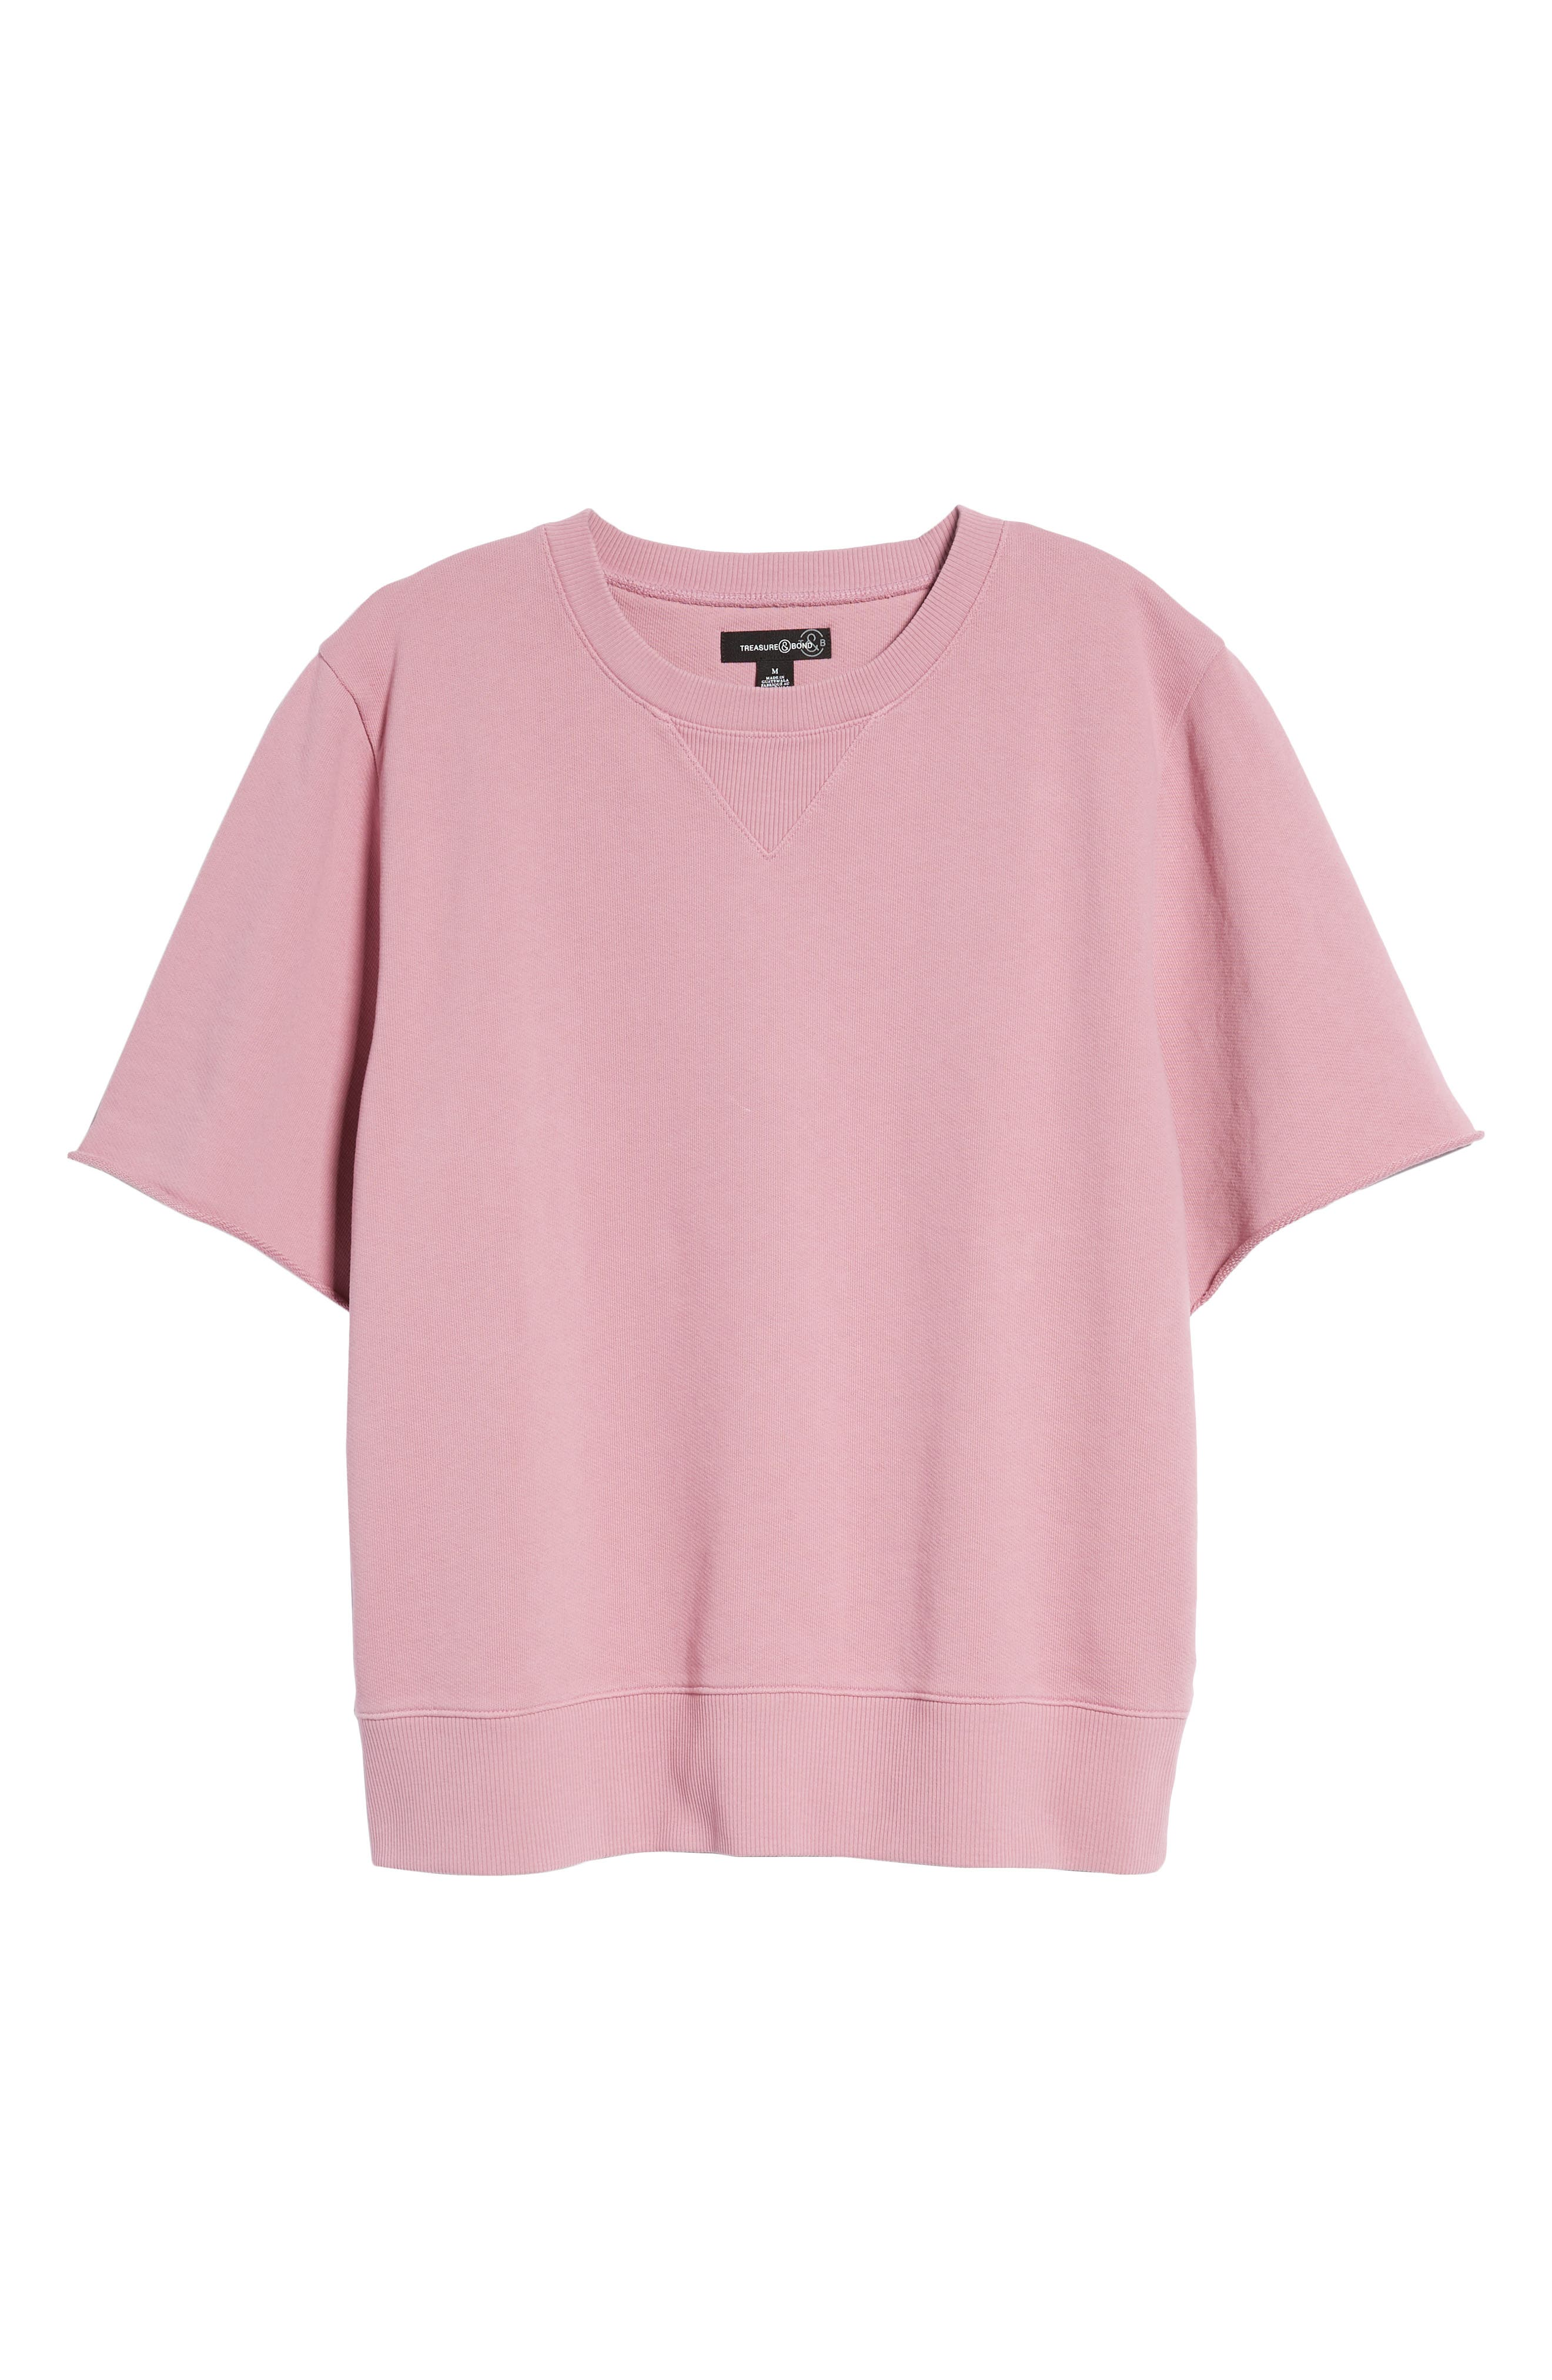 Cotton Terry Sweatshirt,                             Alternate thumbnail 12, color,